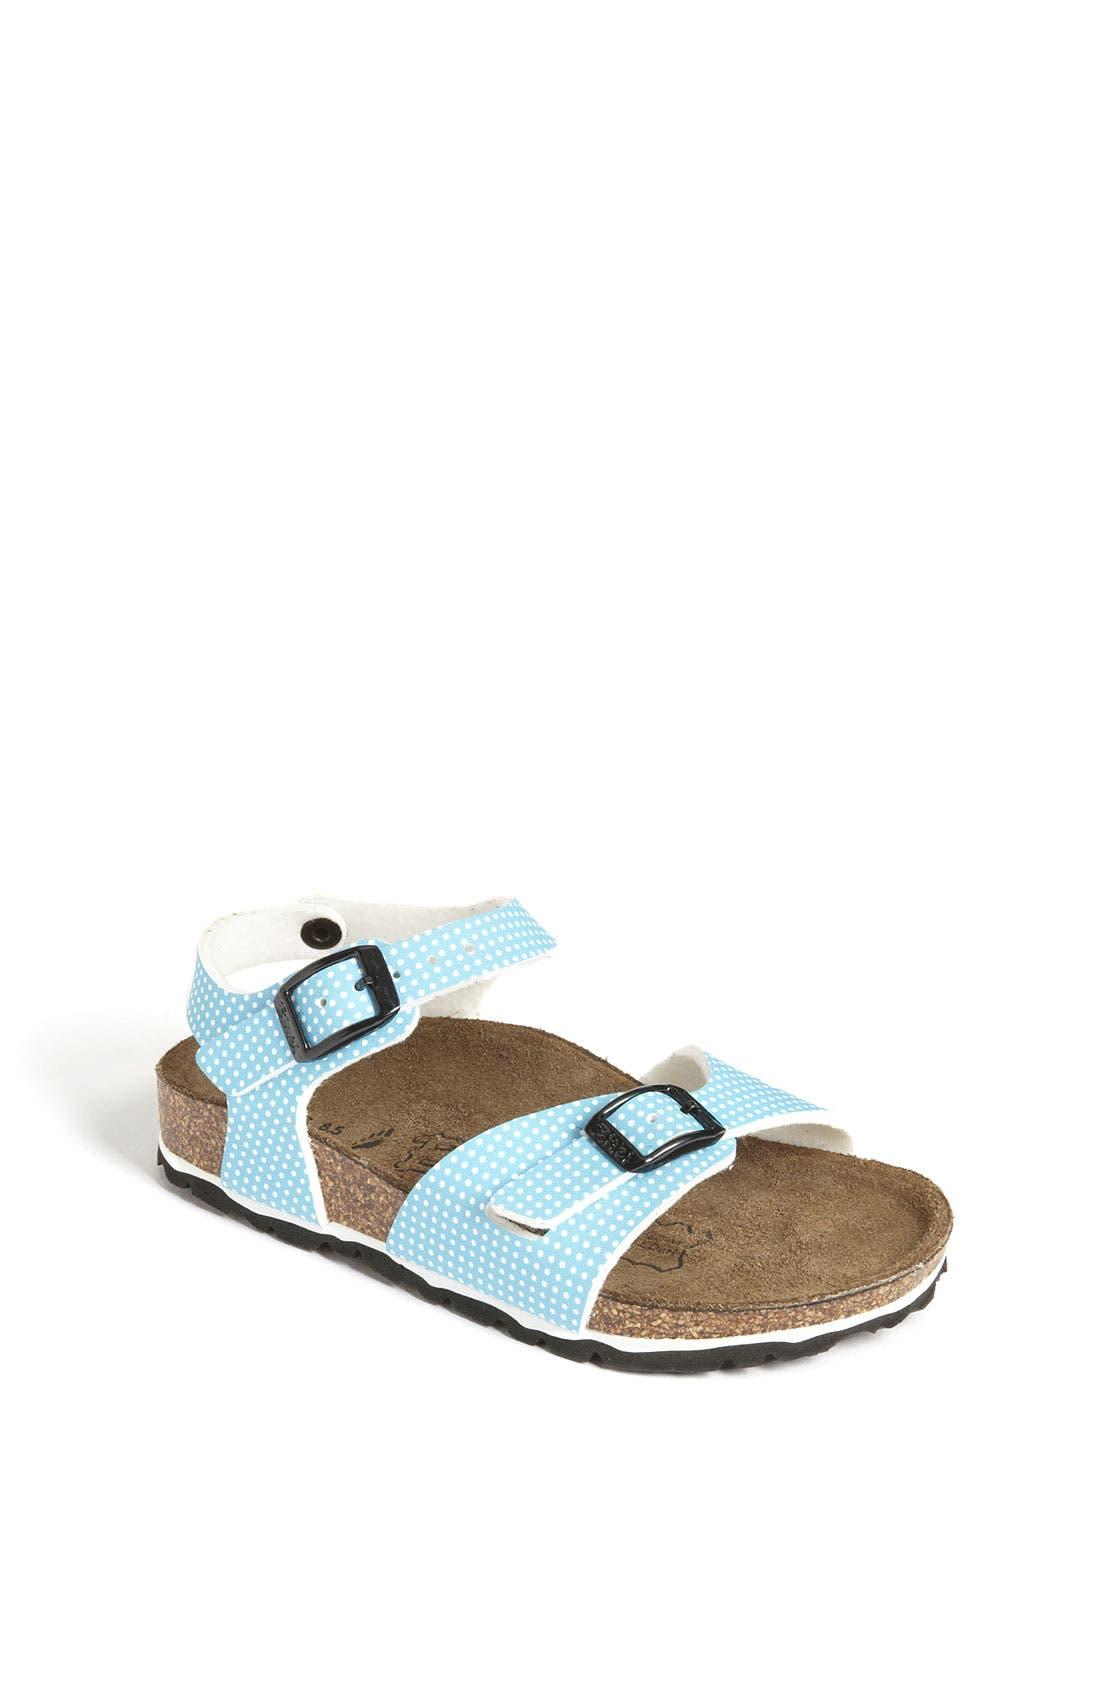 Alternate Image 1 Selected - Birki's® 'Tuvalu' Sandal (Toddler & Little Kid)